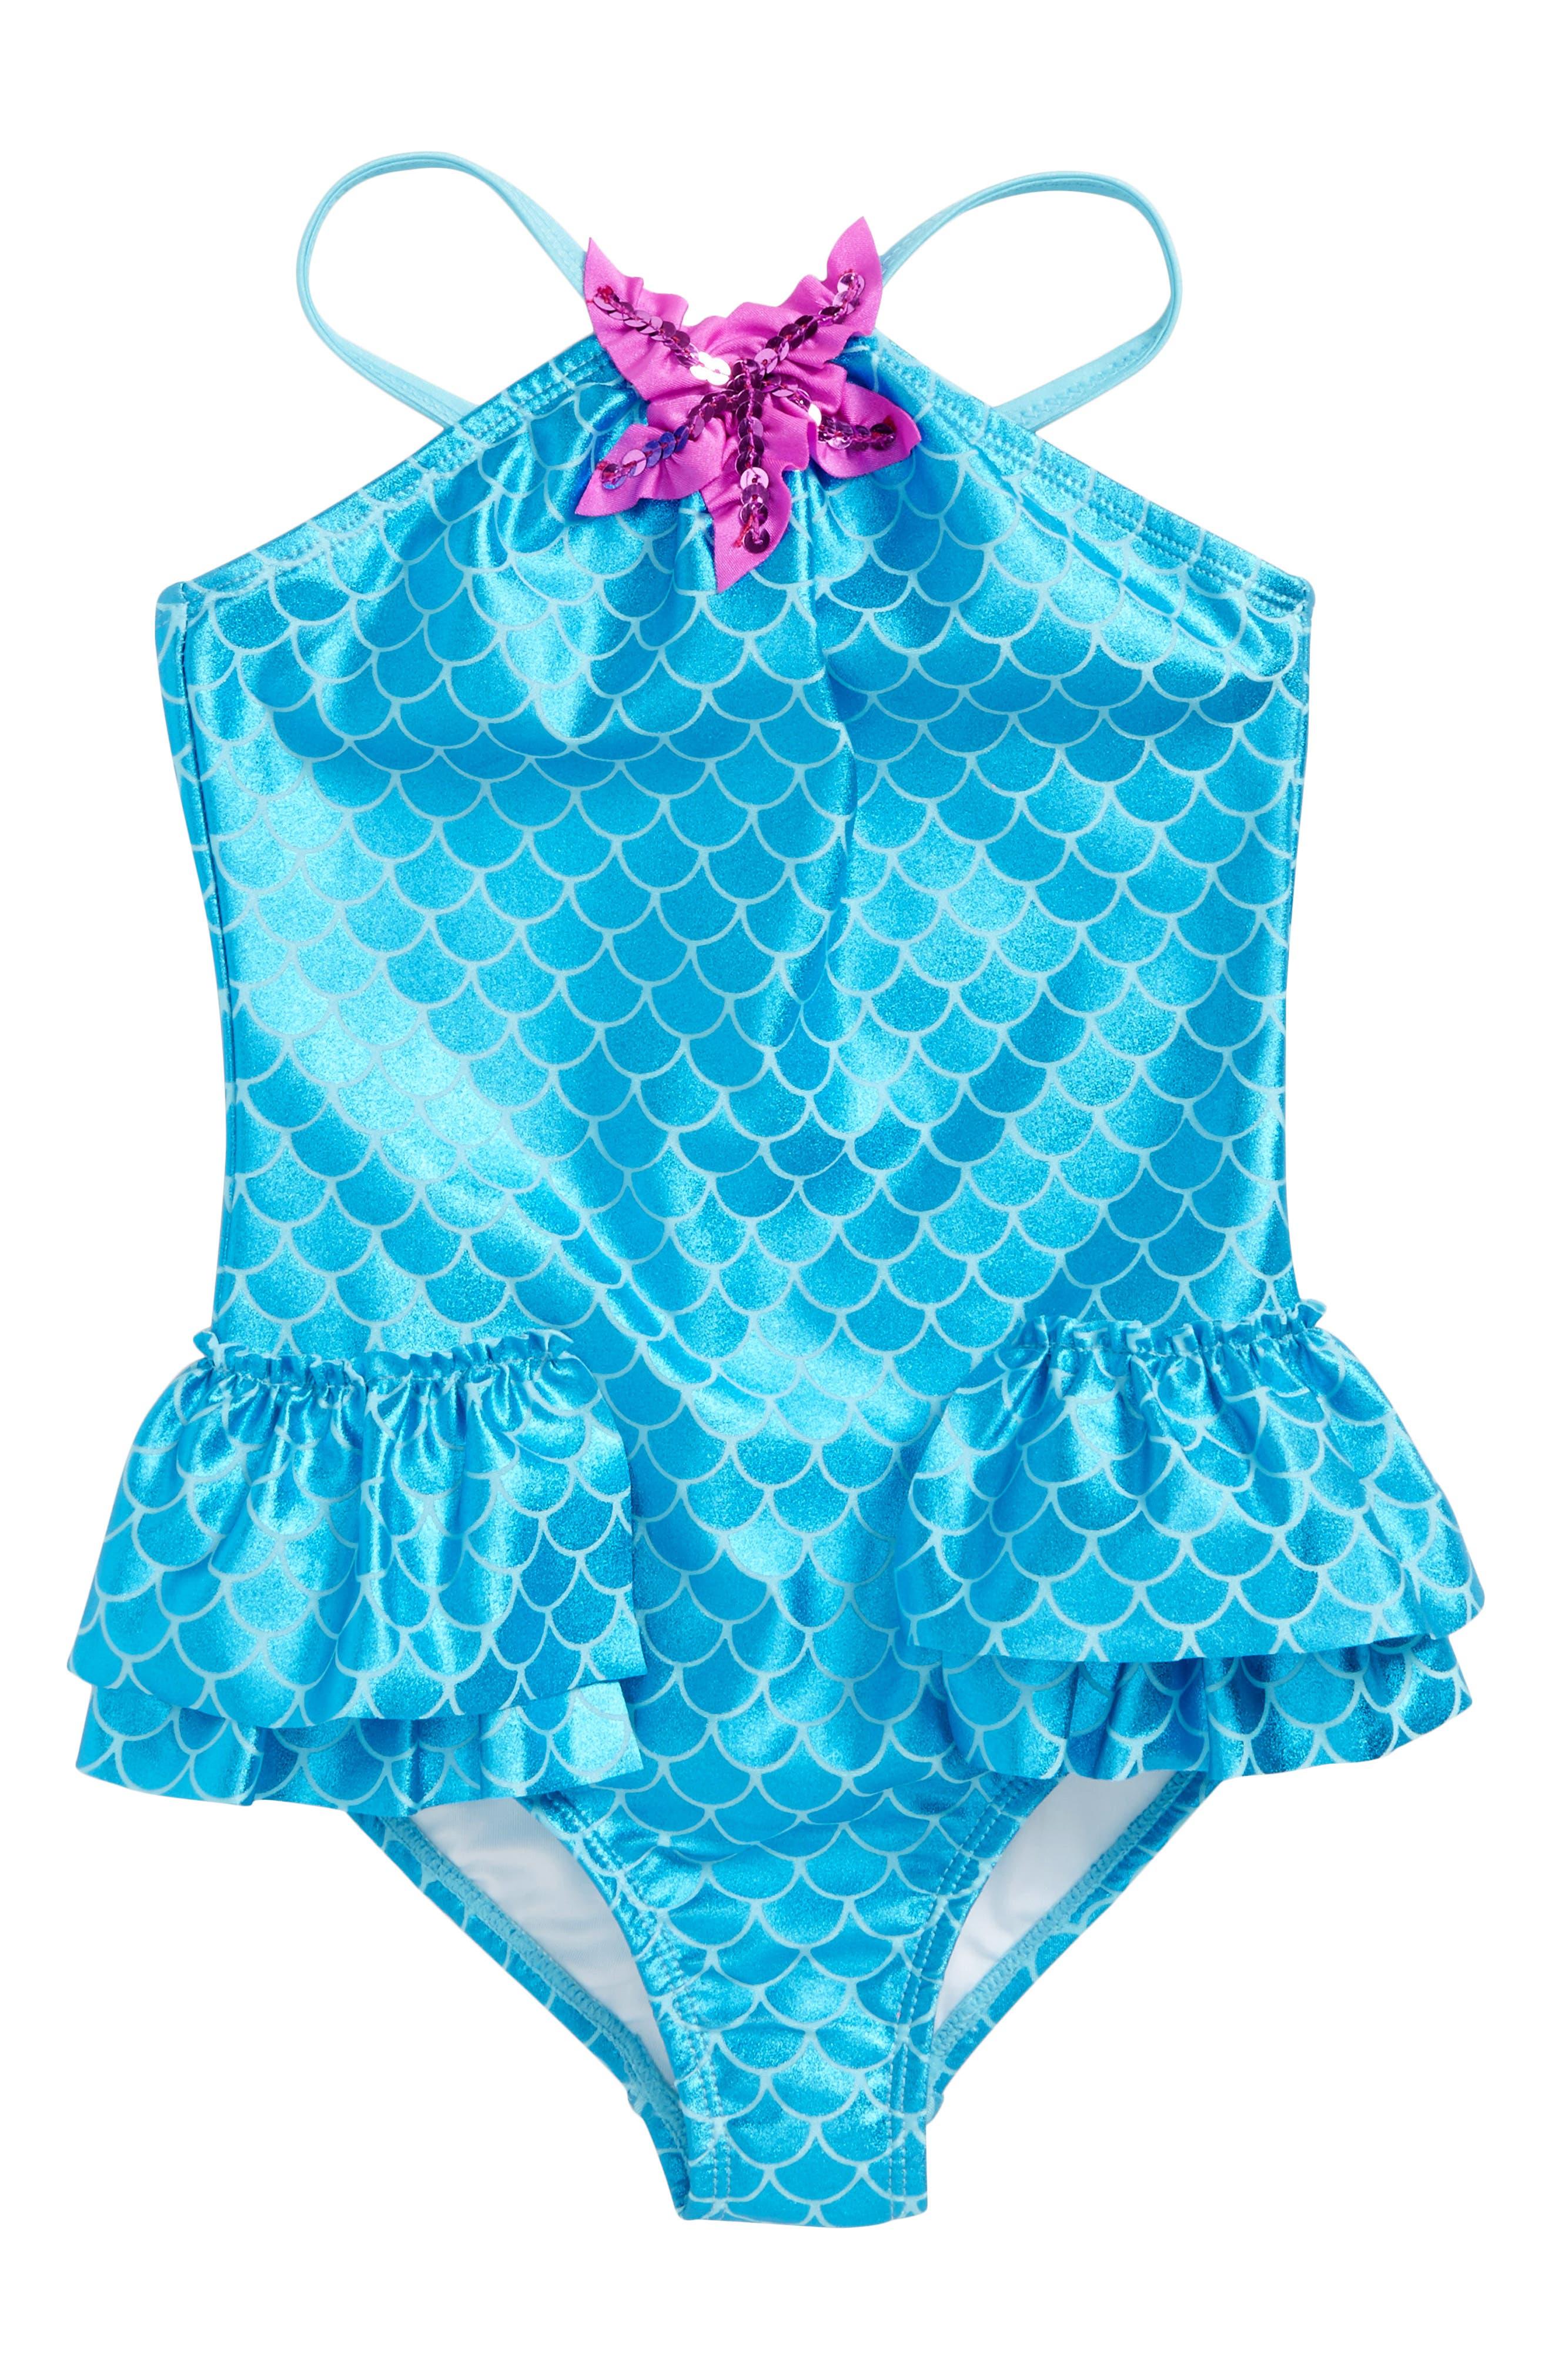 Main Image - Love U Lots Mermaid One-Piece Swimsuit (Toddler Girls & Little Girls)